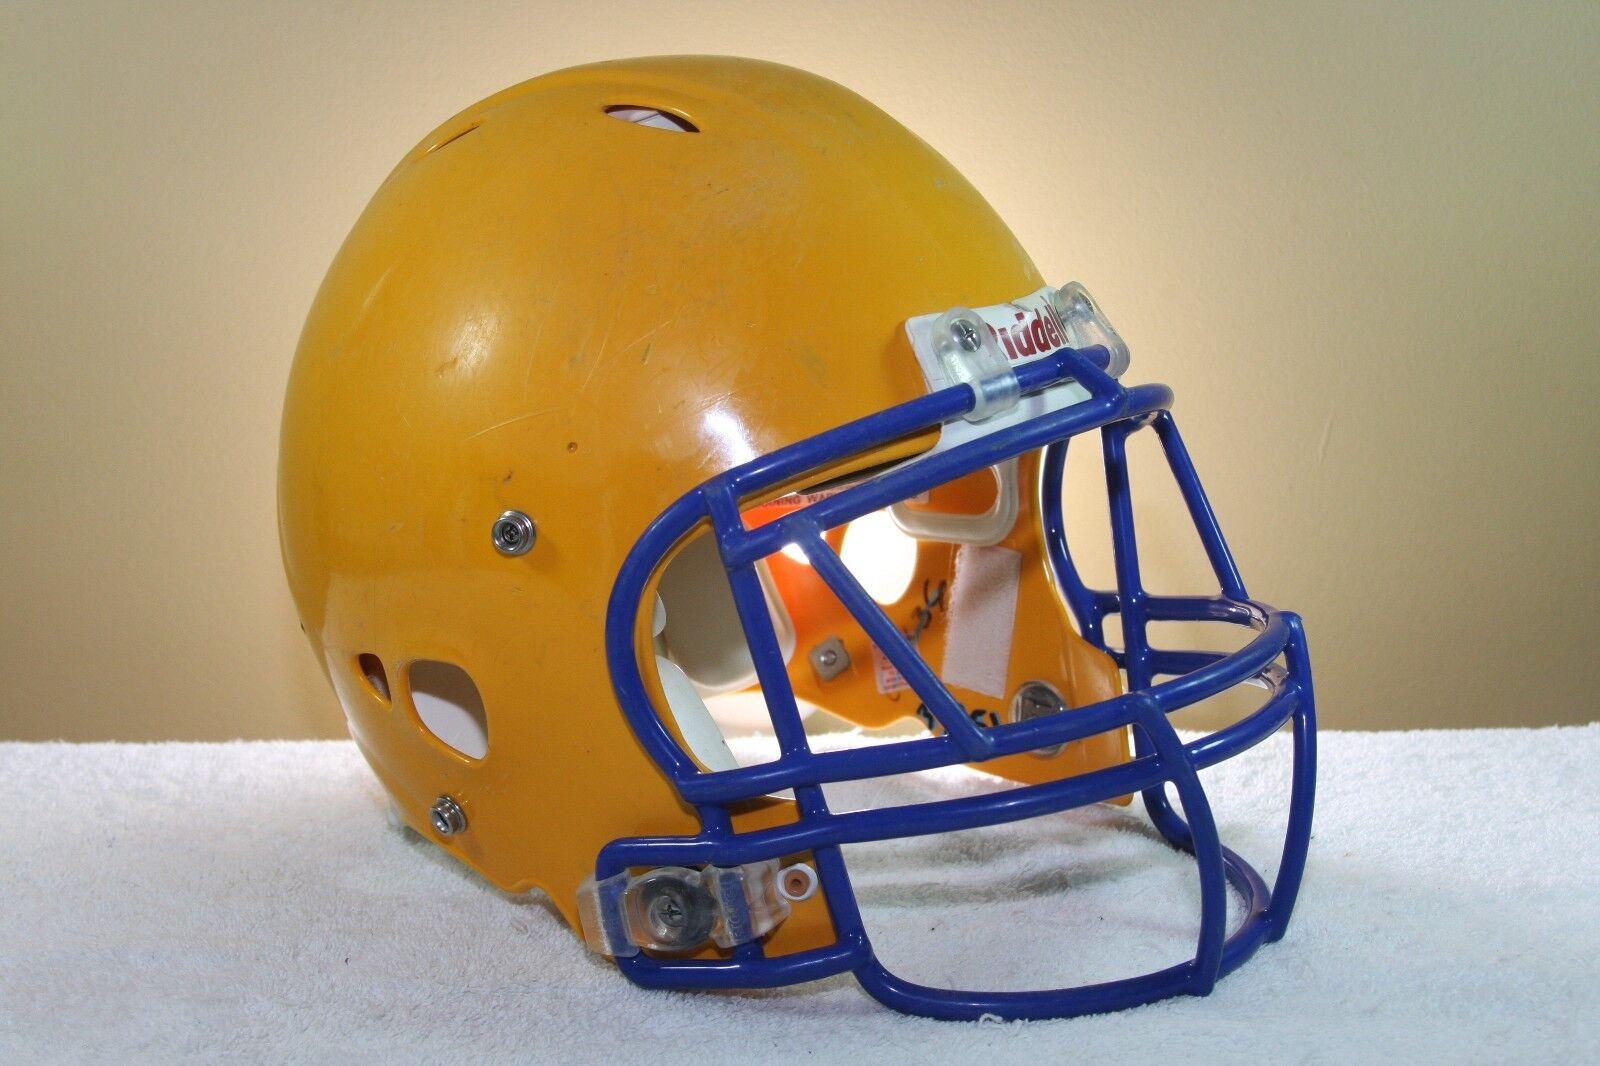 Riddell ADULT Game Used Worn Revolution Football Helmet oro Medium Medium oro 114 1 jawpad e488b1